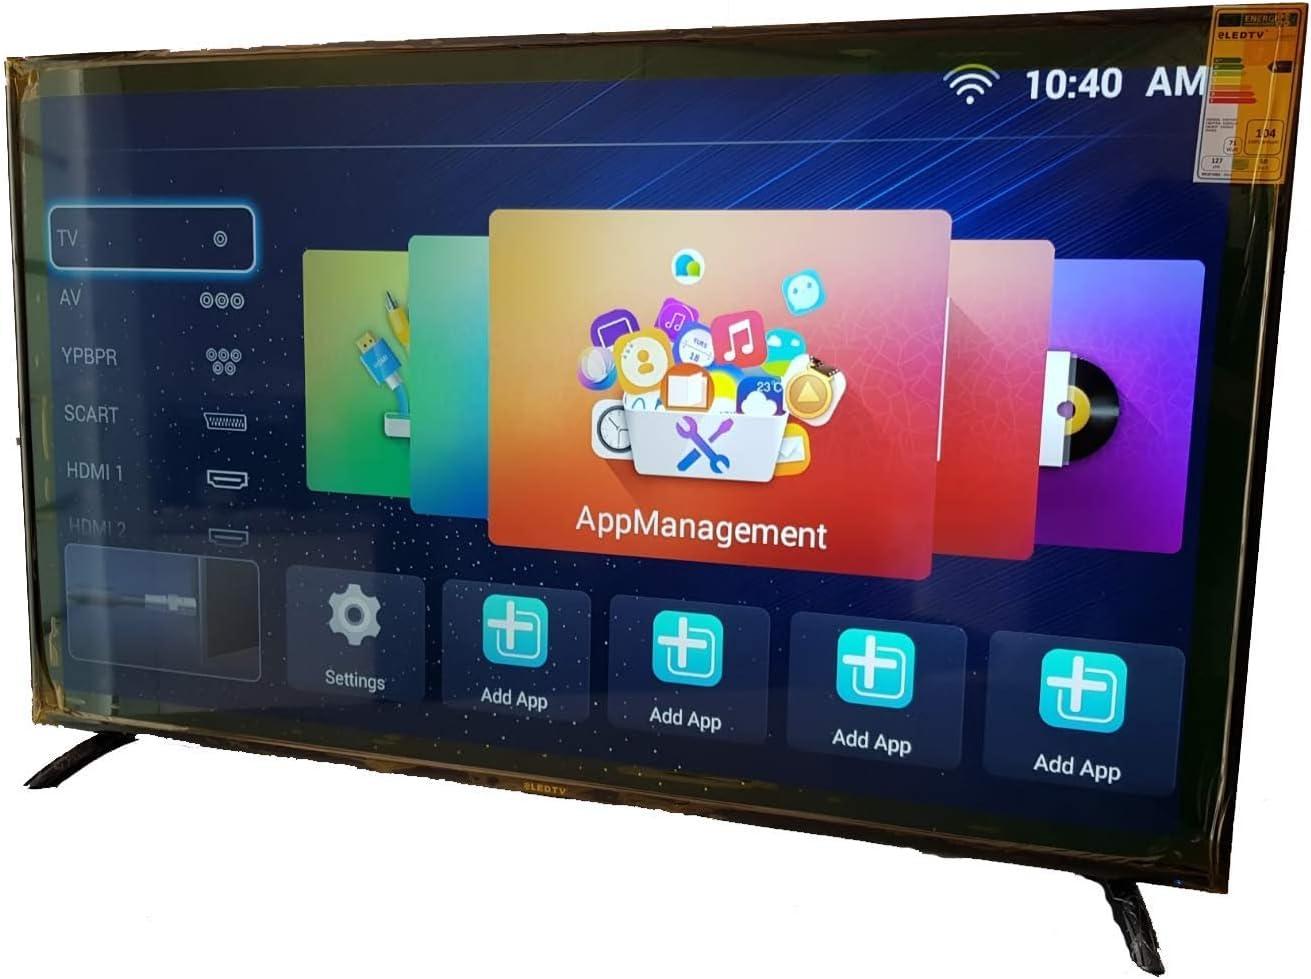 Televisor TV Full HD 1080p 3D eLED 50 Pulgadas: Amazon.es: Electrónica